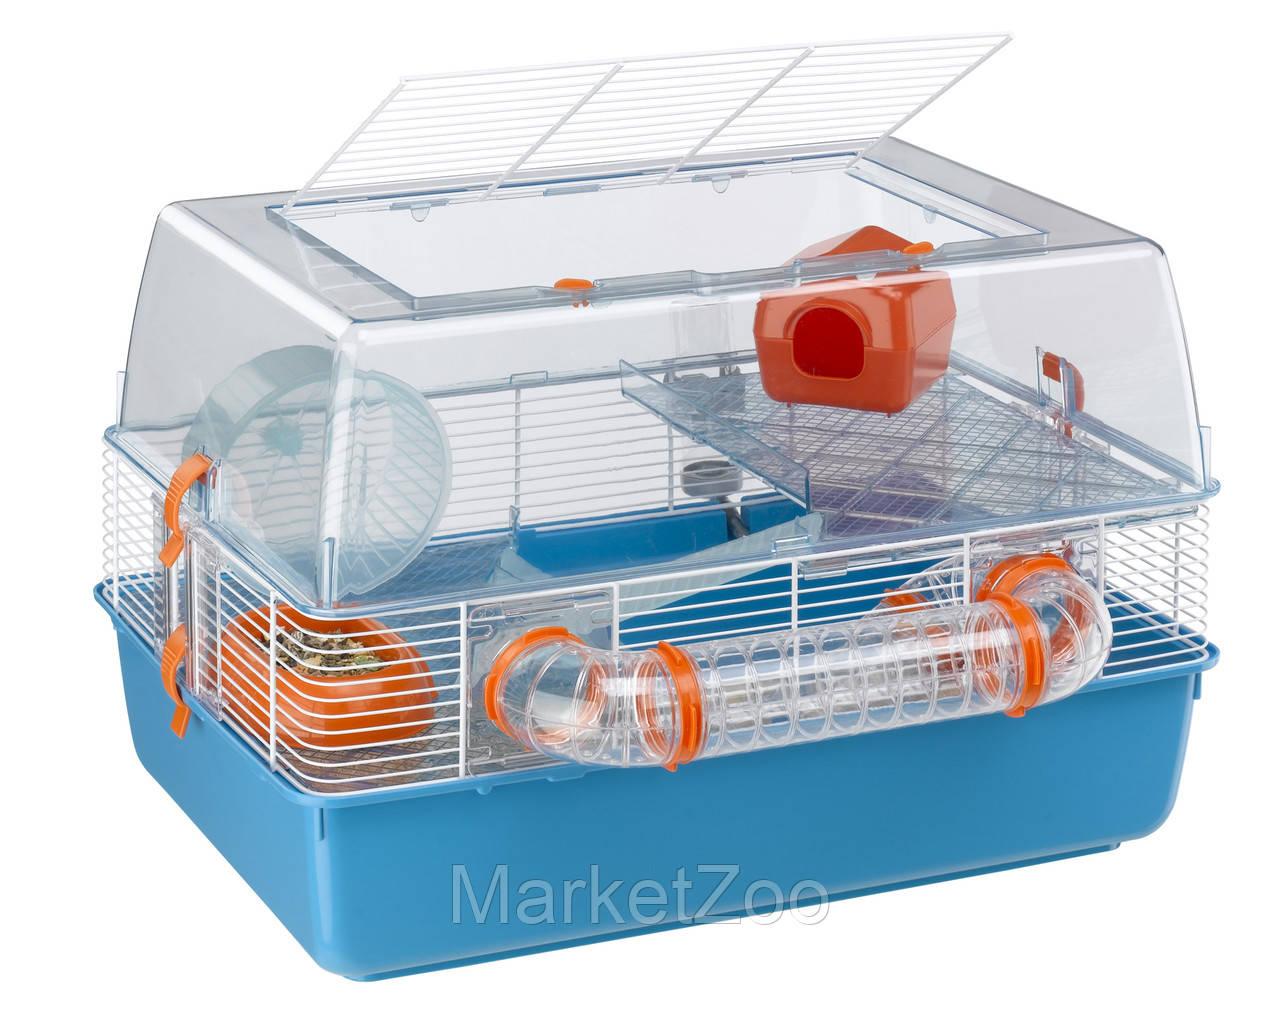 Ferplast (Ферпласт) Duna Fun клетка для мышей и хомяков 55 x 47 x 37 см